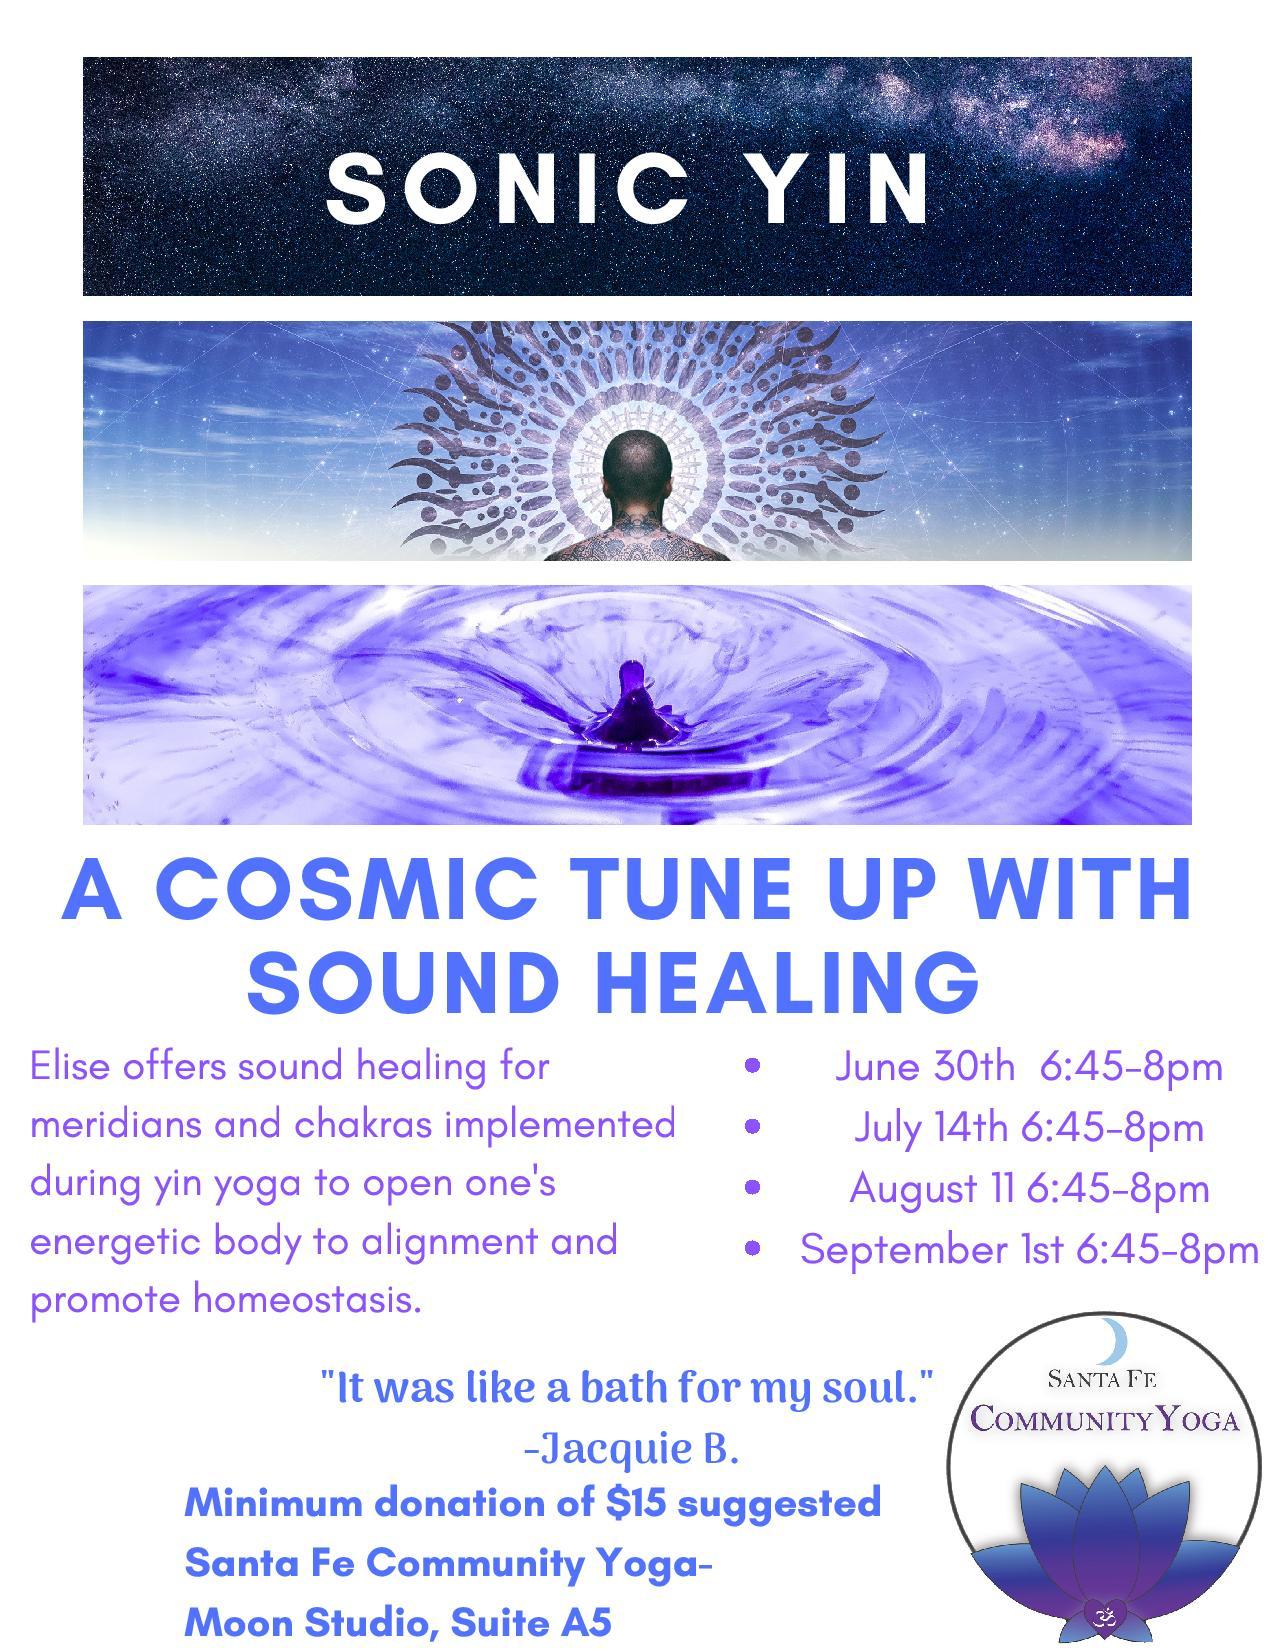 sonic yin santa fe